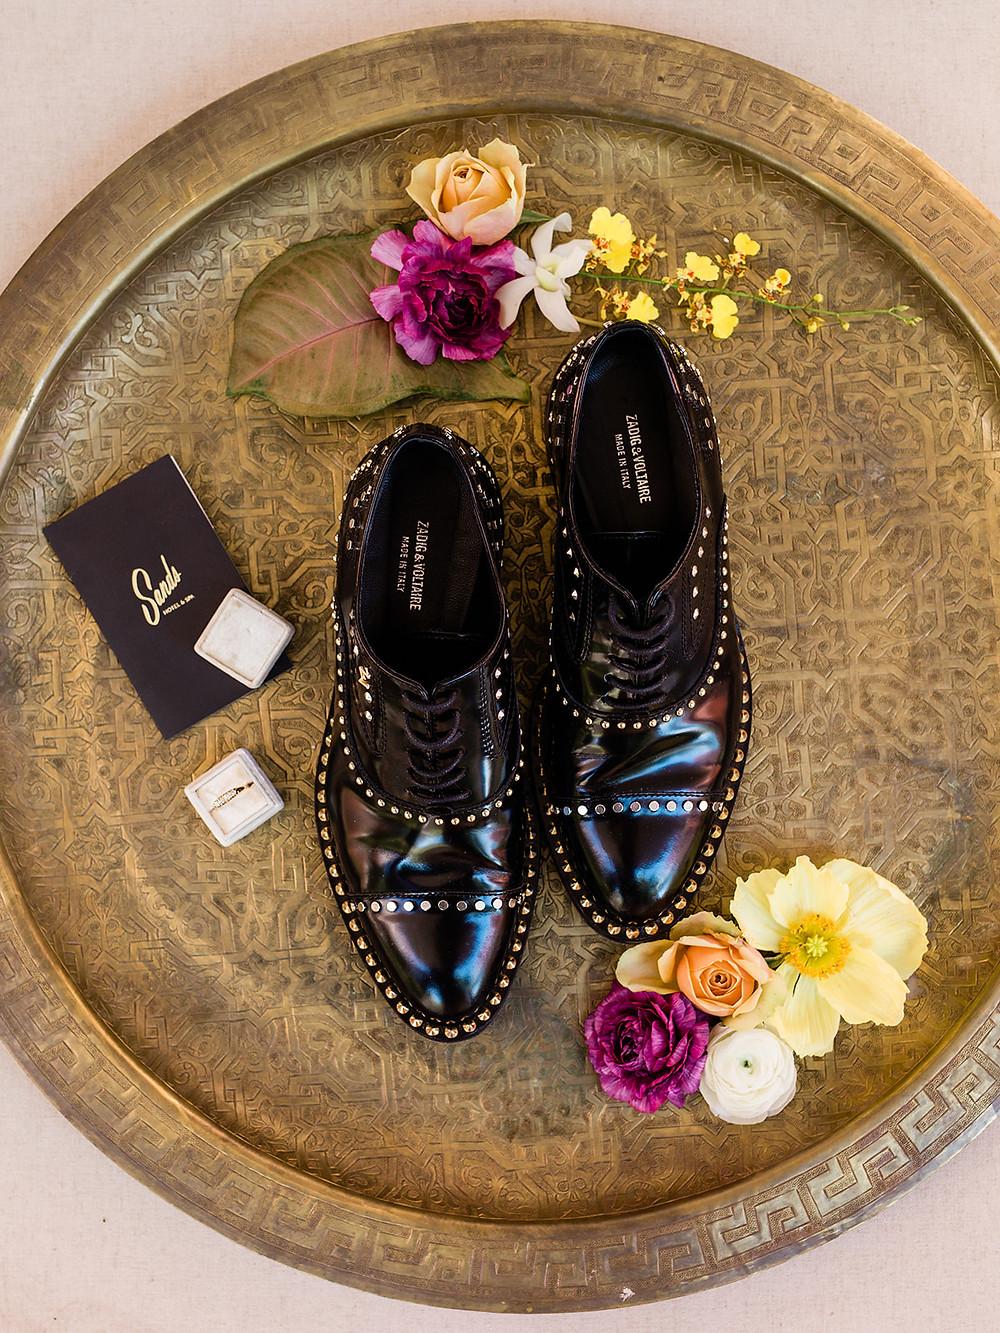 shoe styling - Modern Moroccan Desert Glam Editorial - LGBTQ Wedding Editoiral - Wedding Design Inspiration - Muted Desert Tones - Modern Glam Jungle Chic